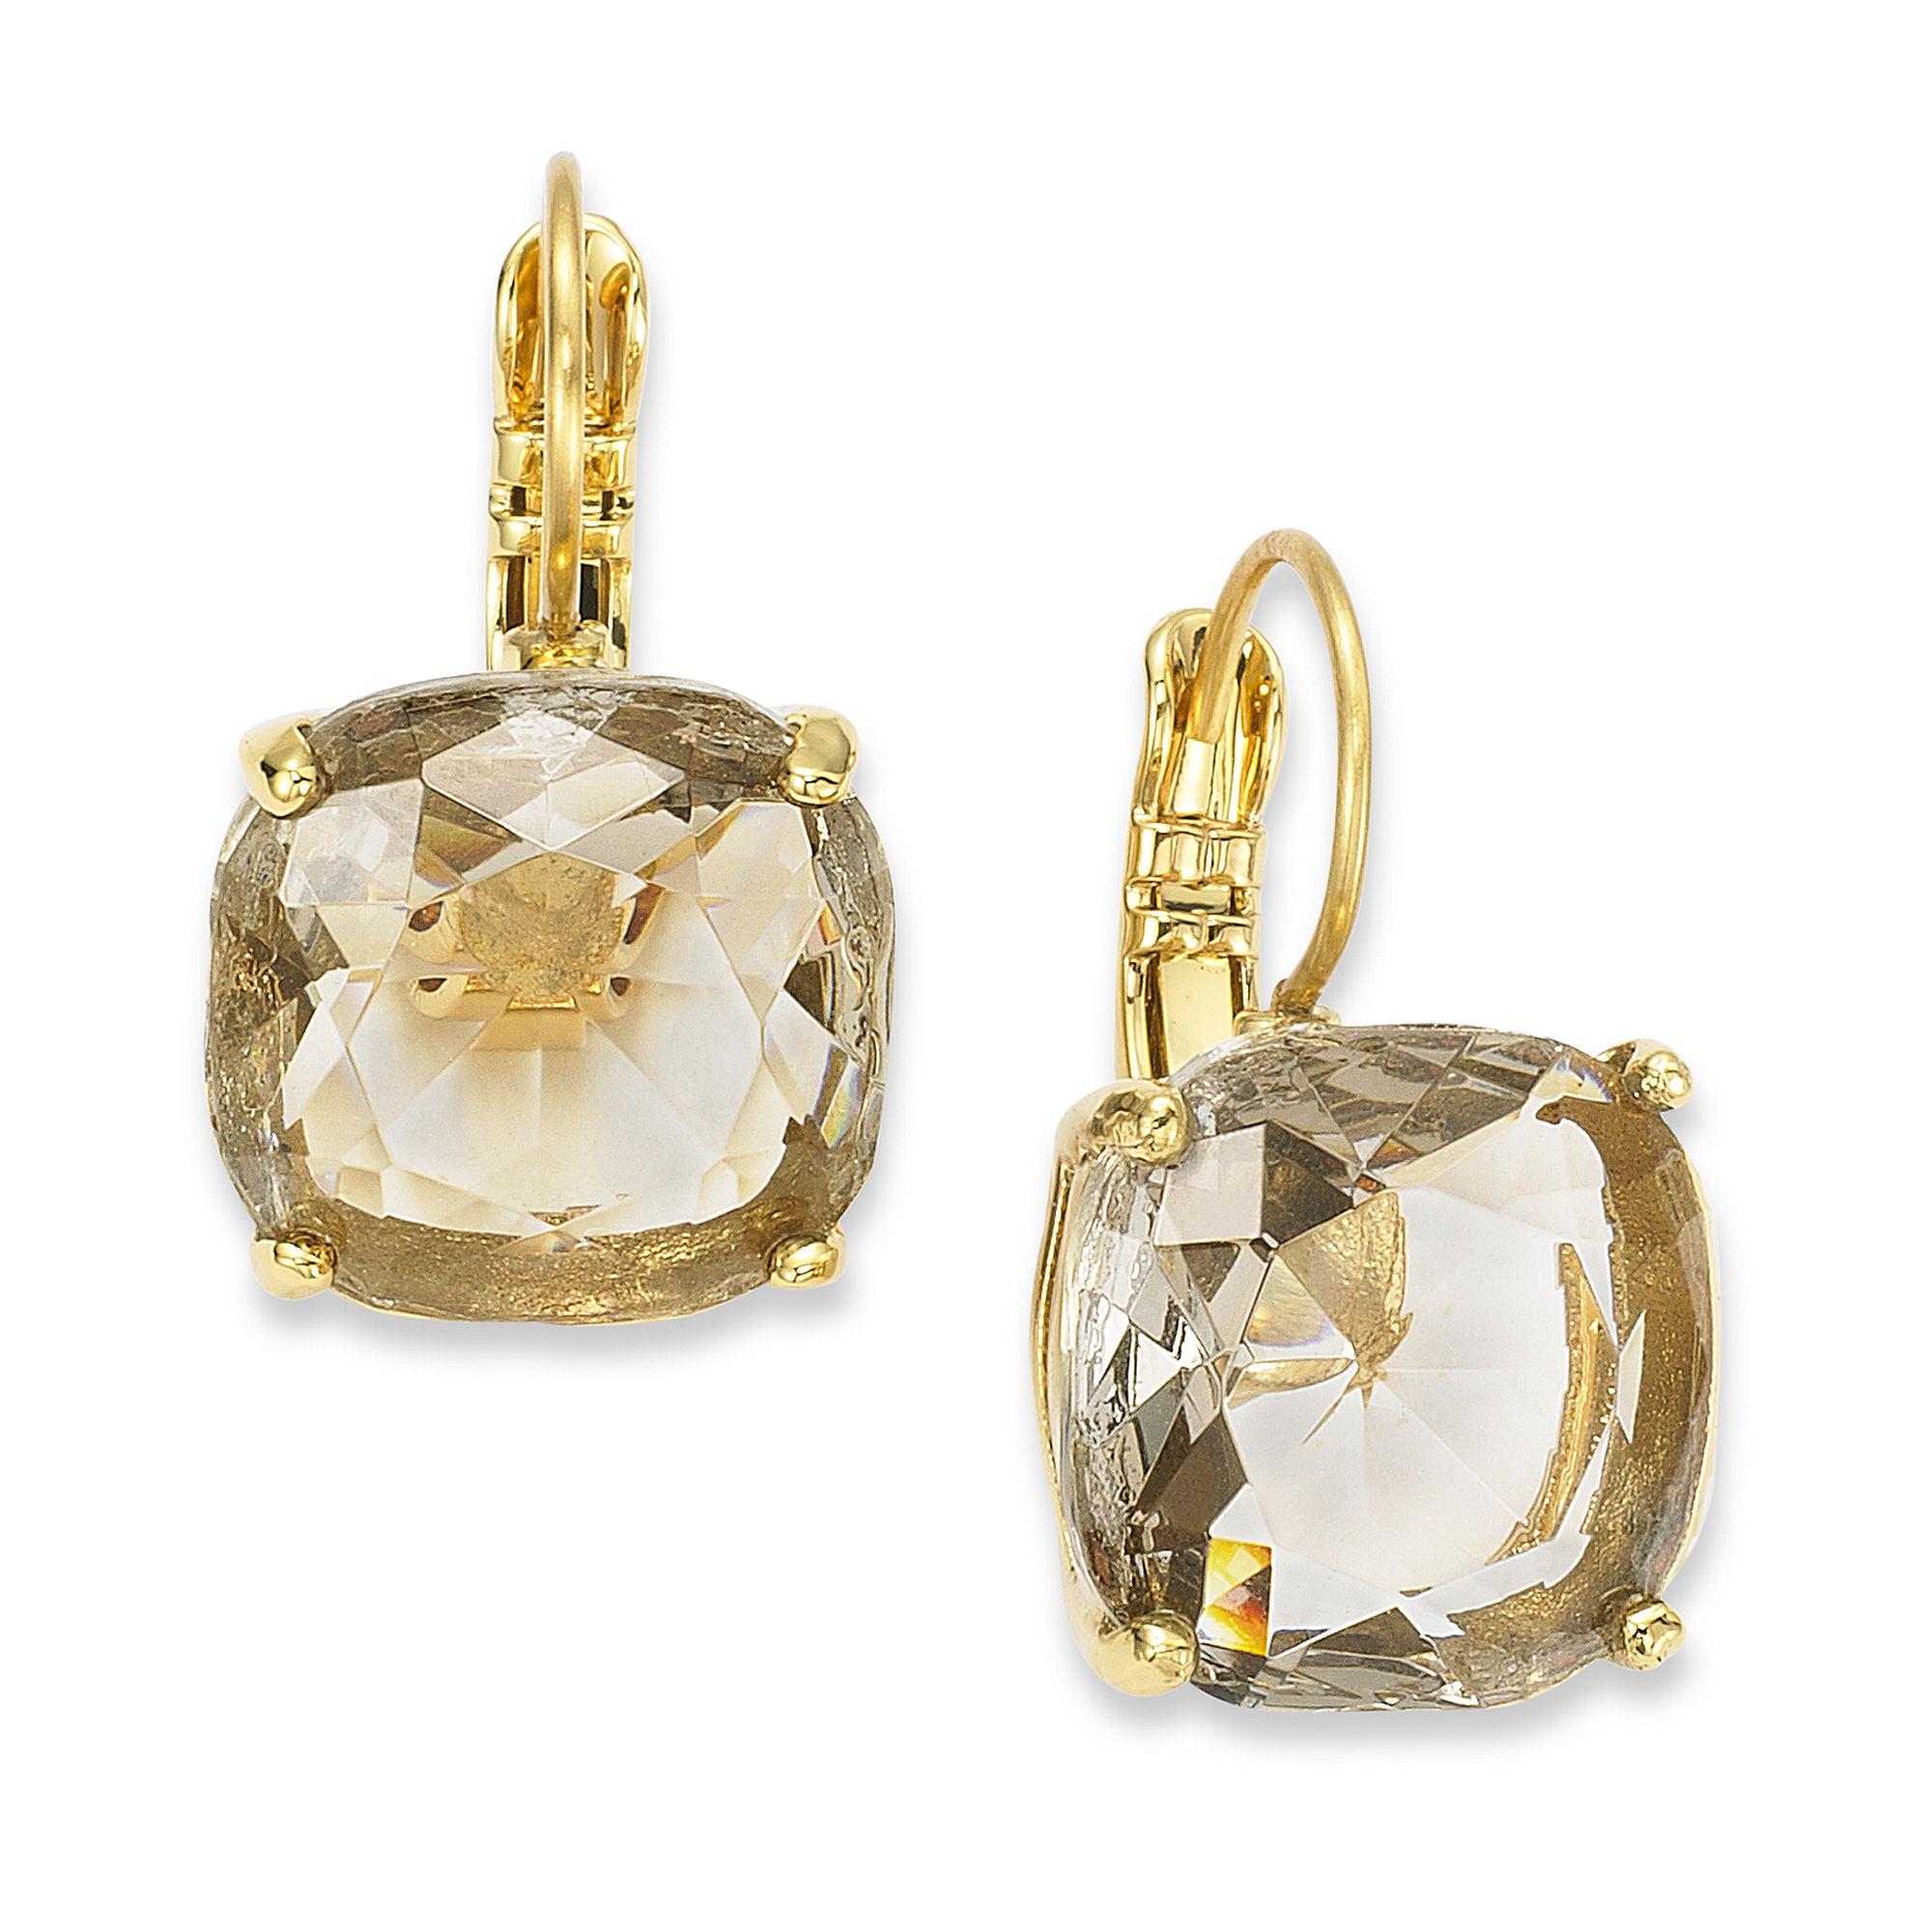 Kate spade new york Kate Spade New York Earrings 12k Gold Plated